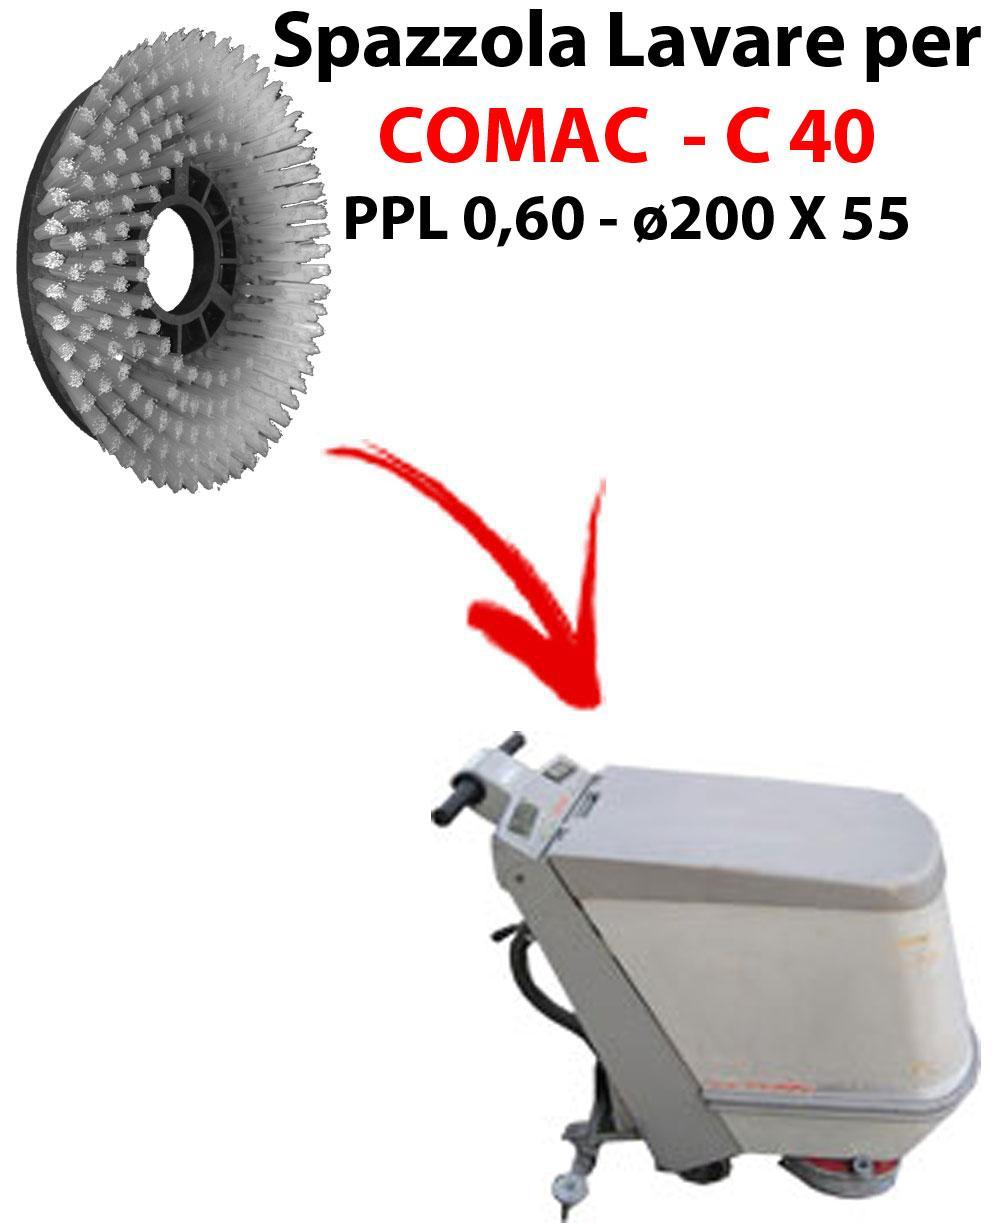 SPAZZOLA LAVARE  per lavapavimenti COMAC  C 40 SPECIAL BRUSH L17